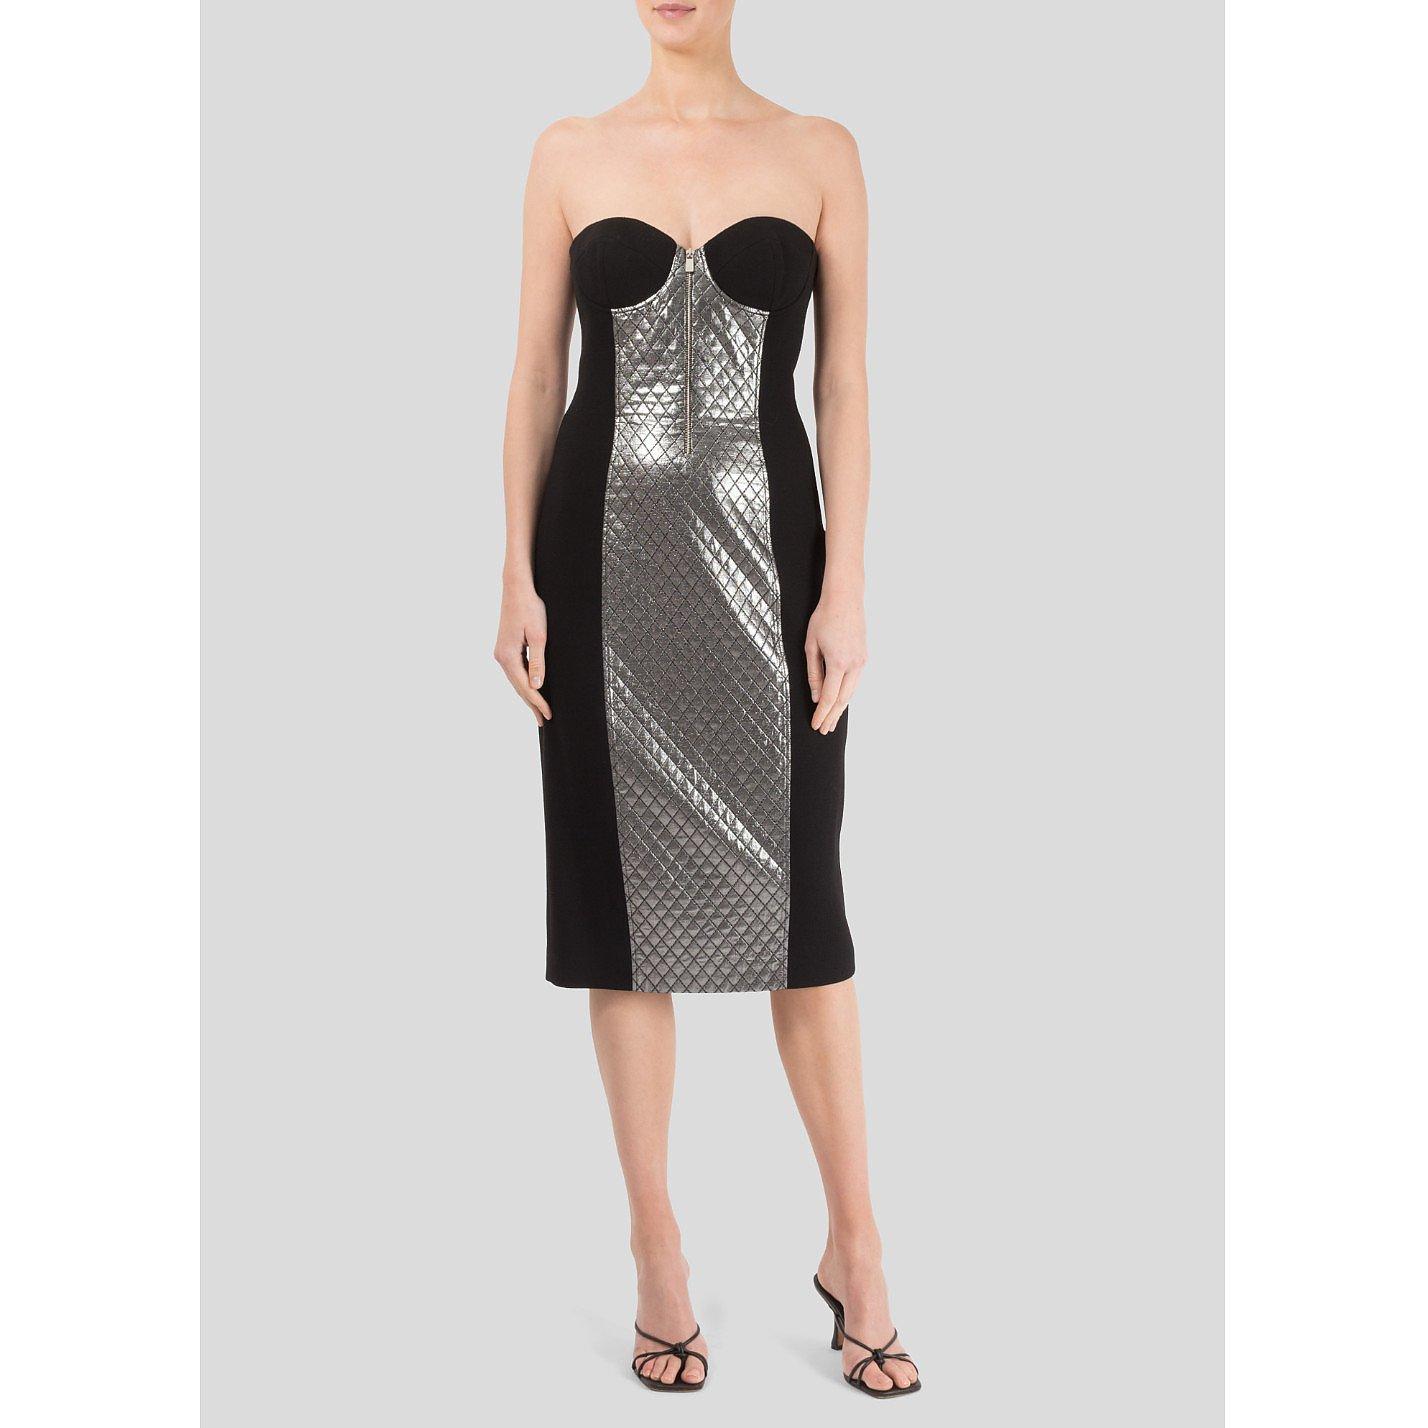 Michael Kors Dress With A Metallic Front Panel